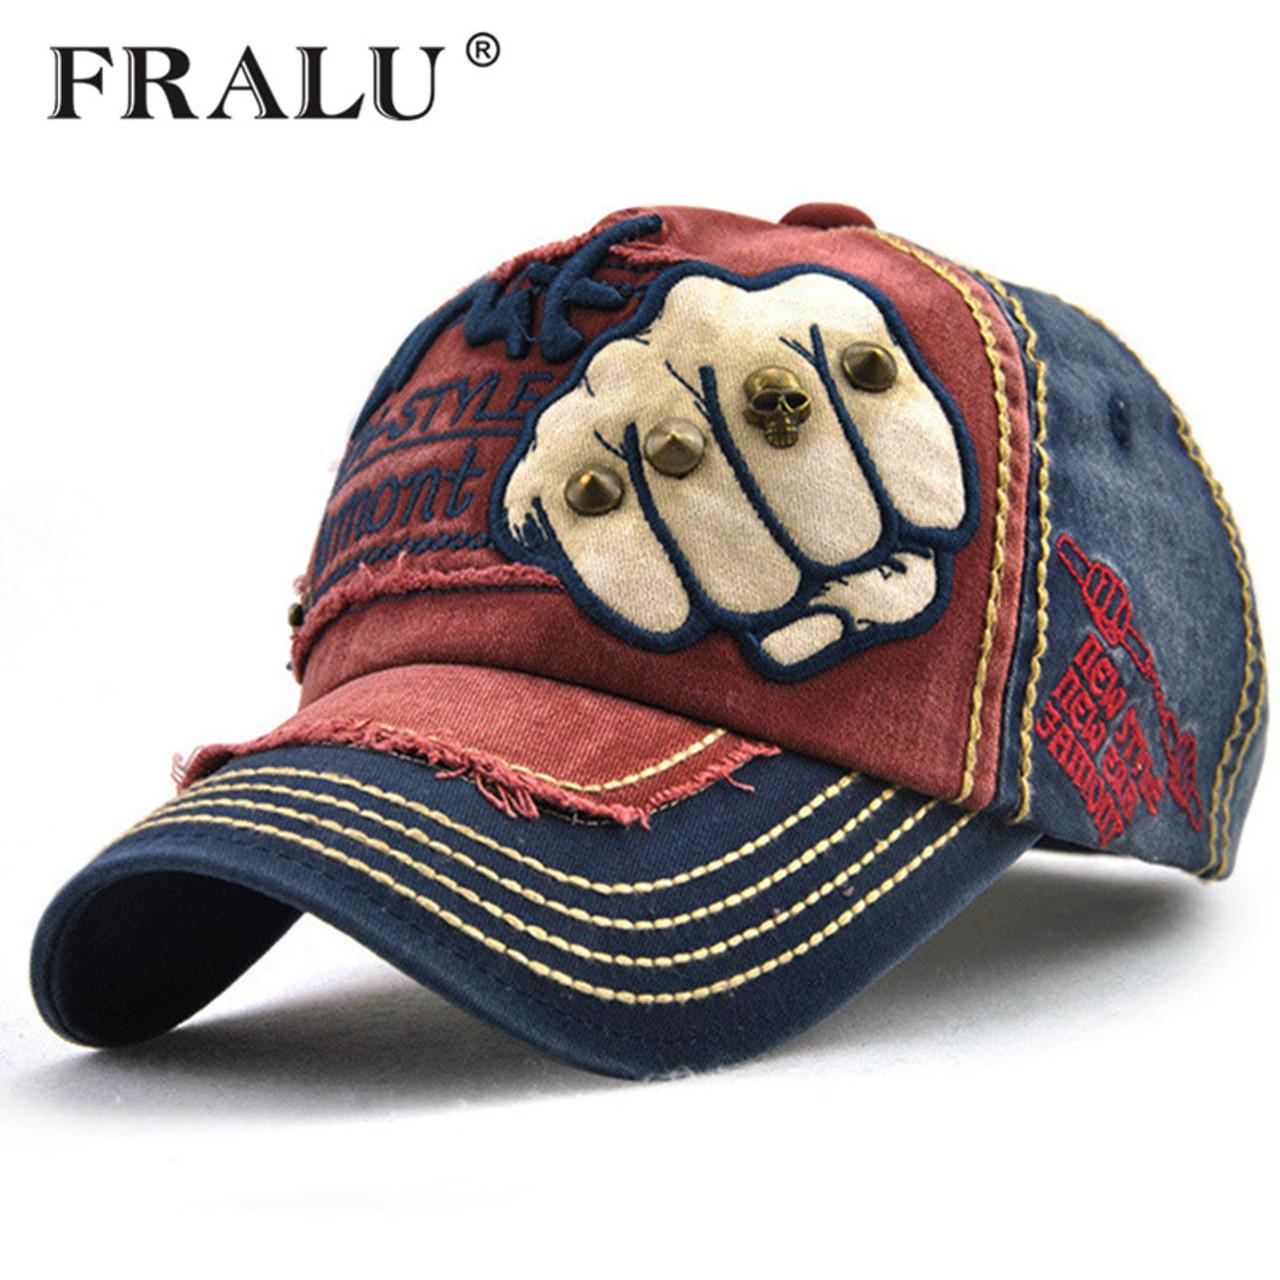 a5ec022144d FRALU New unisex fashion men s Baseball Cap women snapback hat Cotton  Casual caps Summer fall Hat for men cap wholesale - OnshopDeals.Com